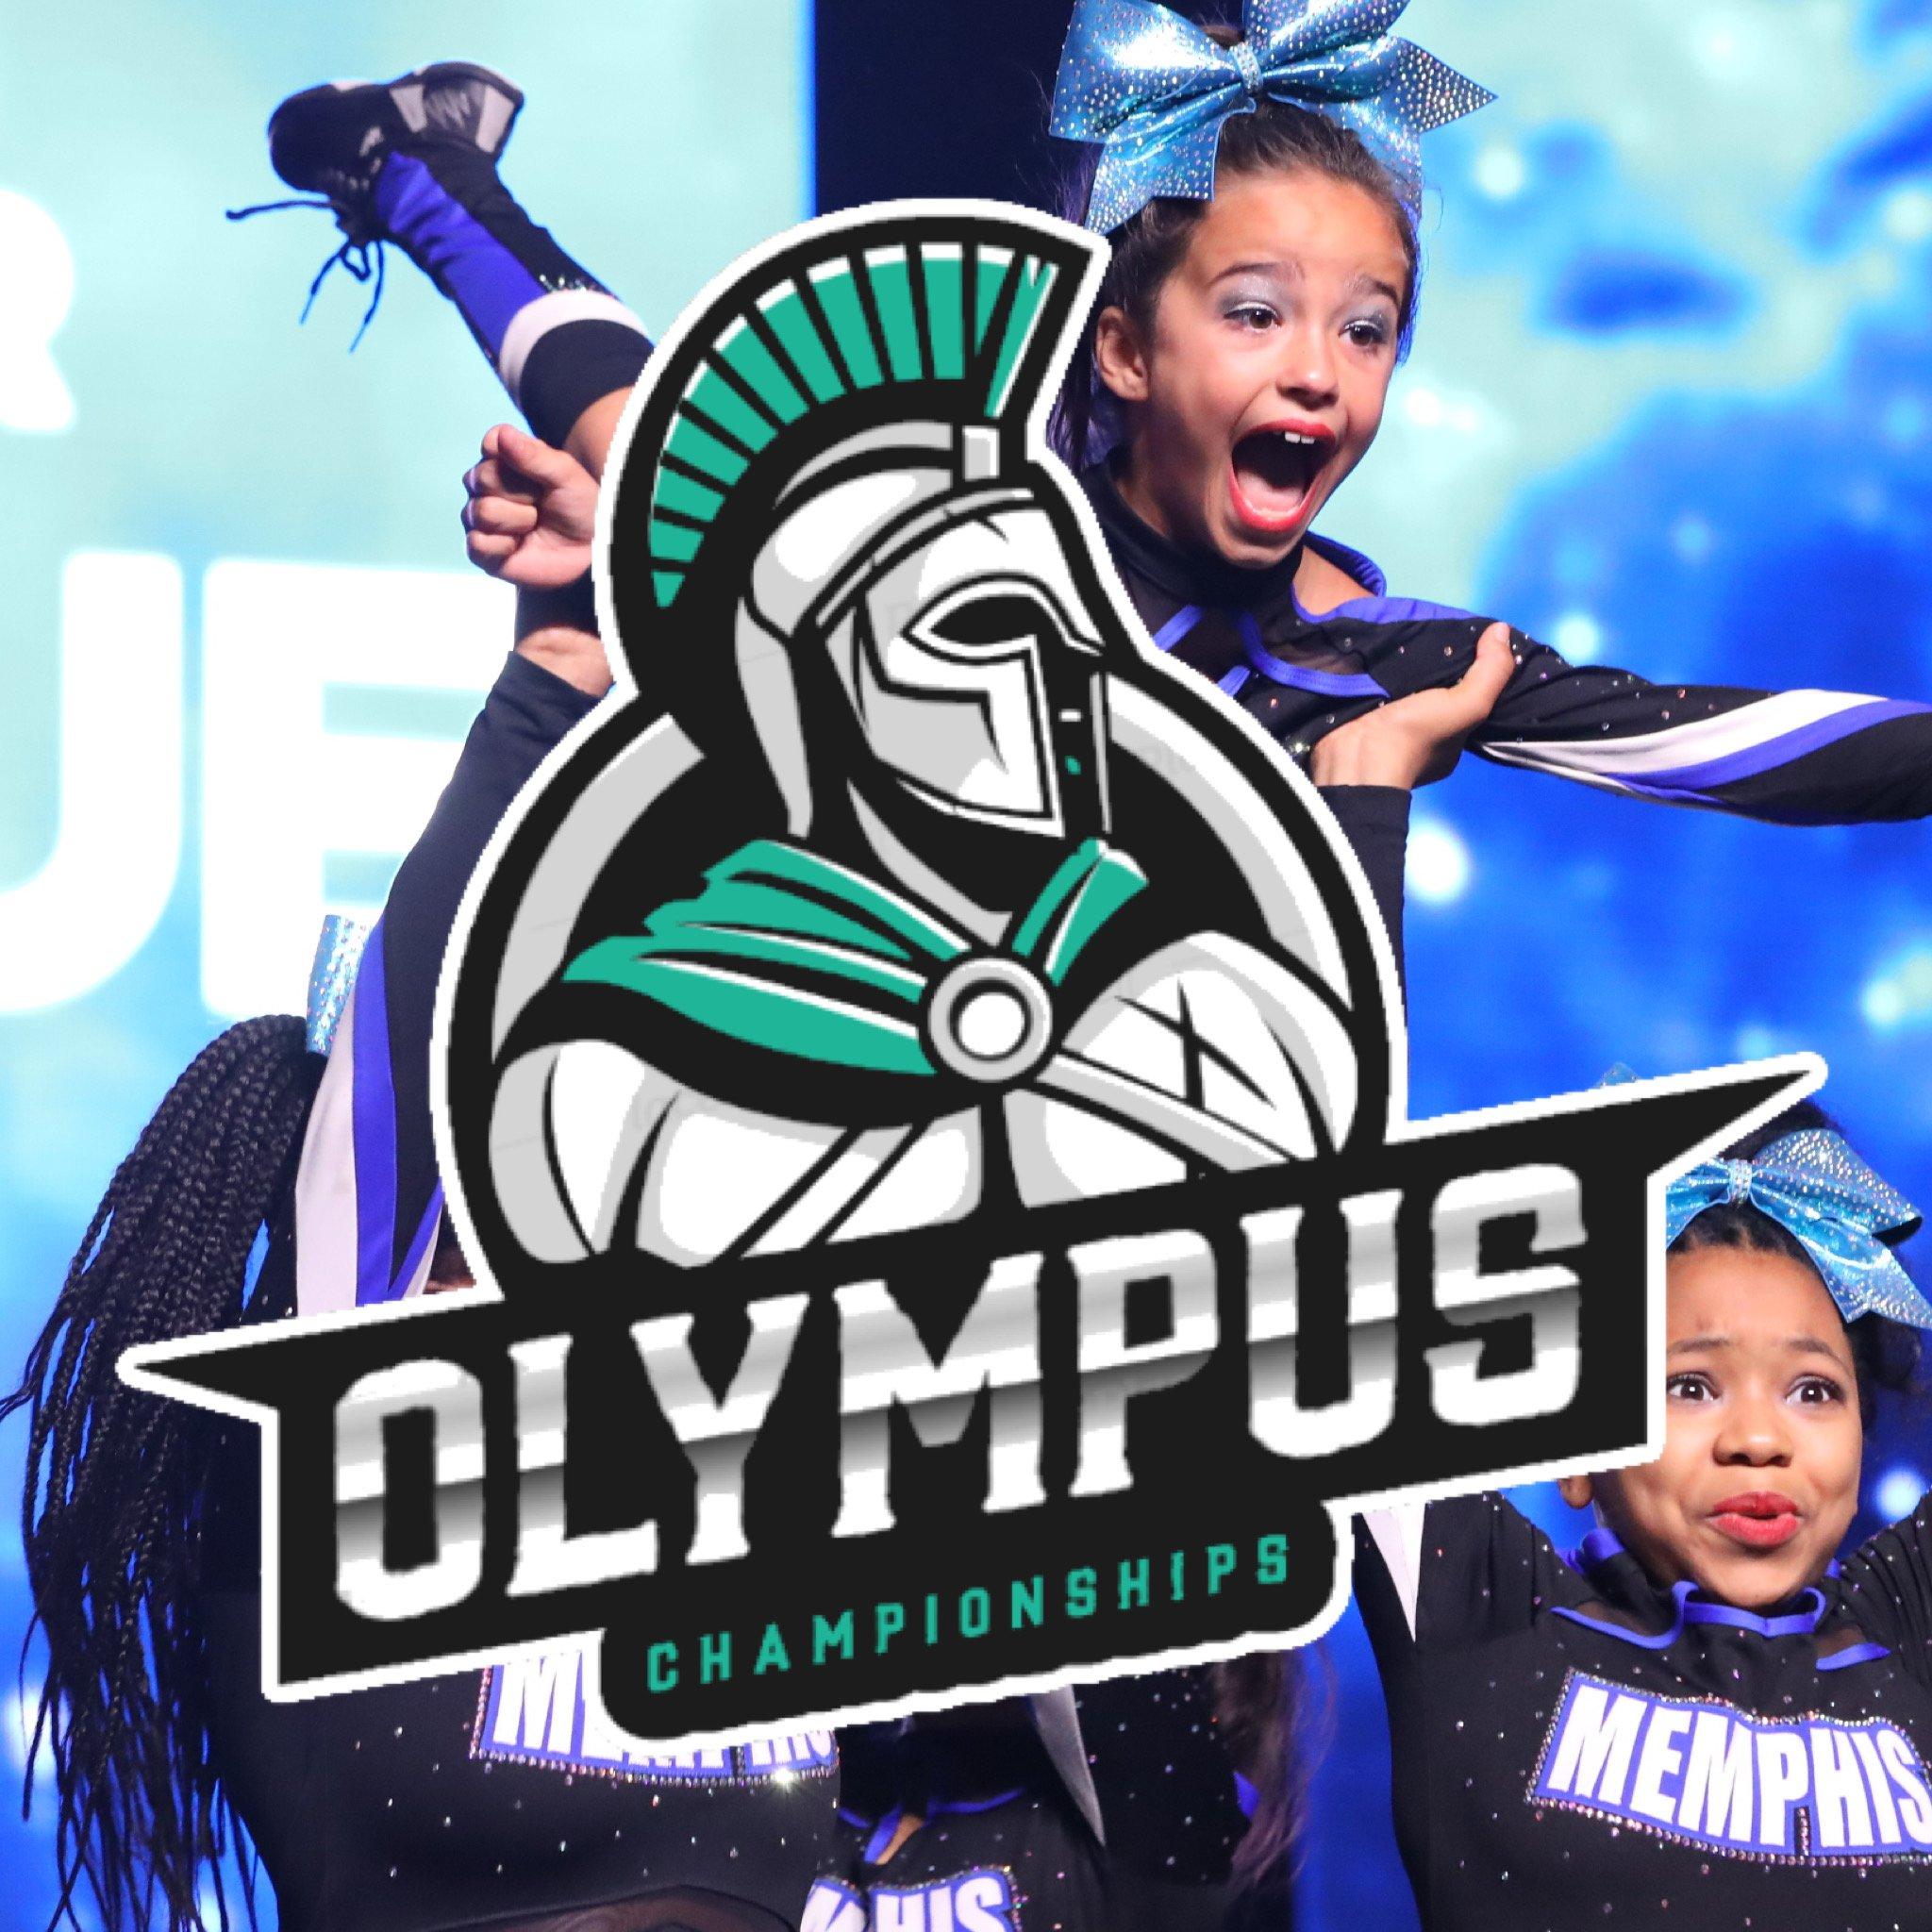 Olympus Championships